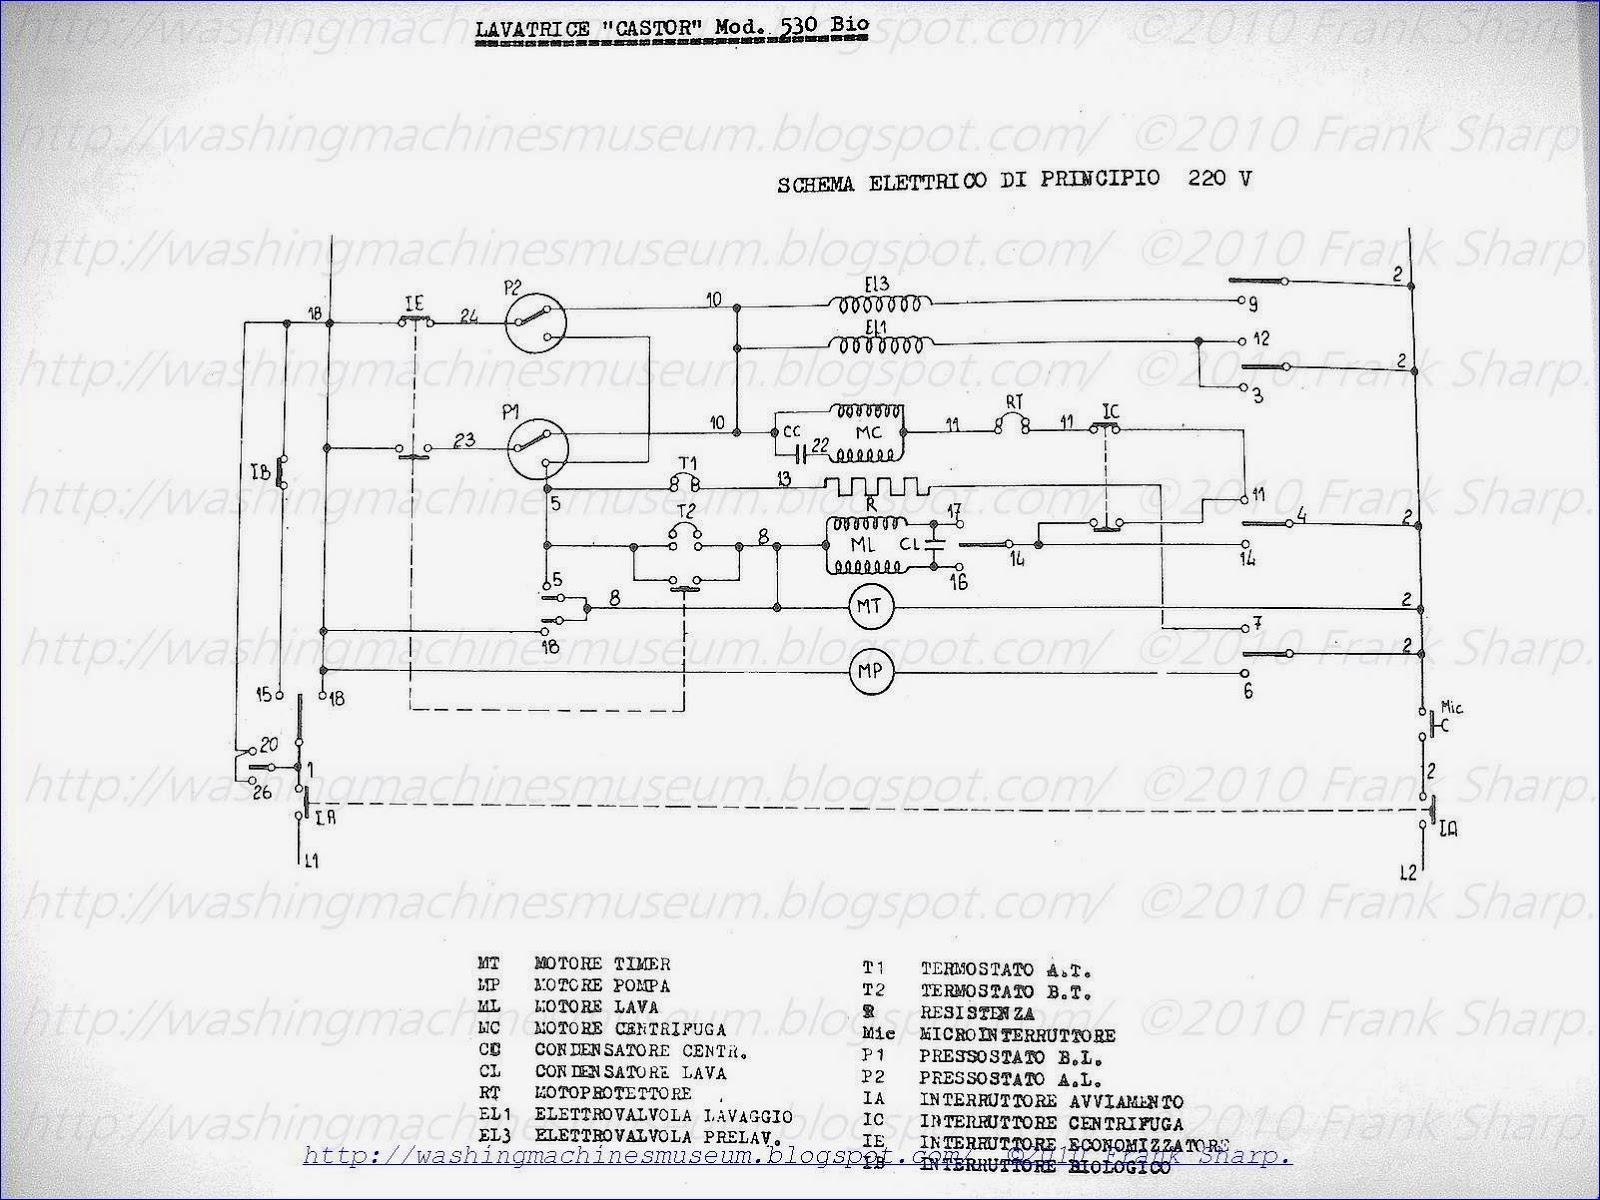 sharp washing machine schematic diagram